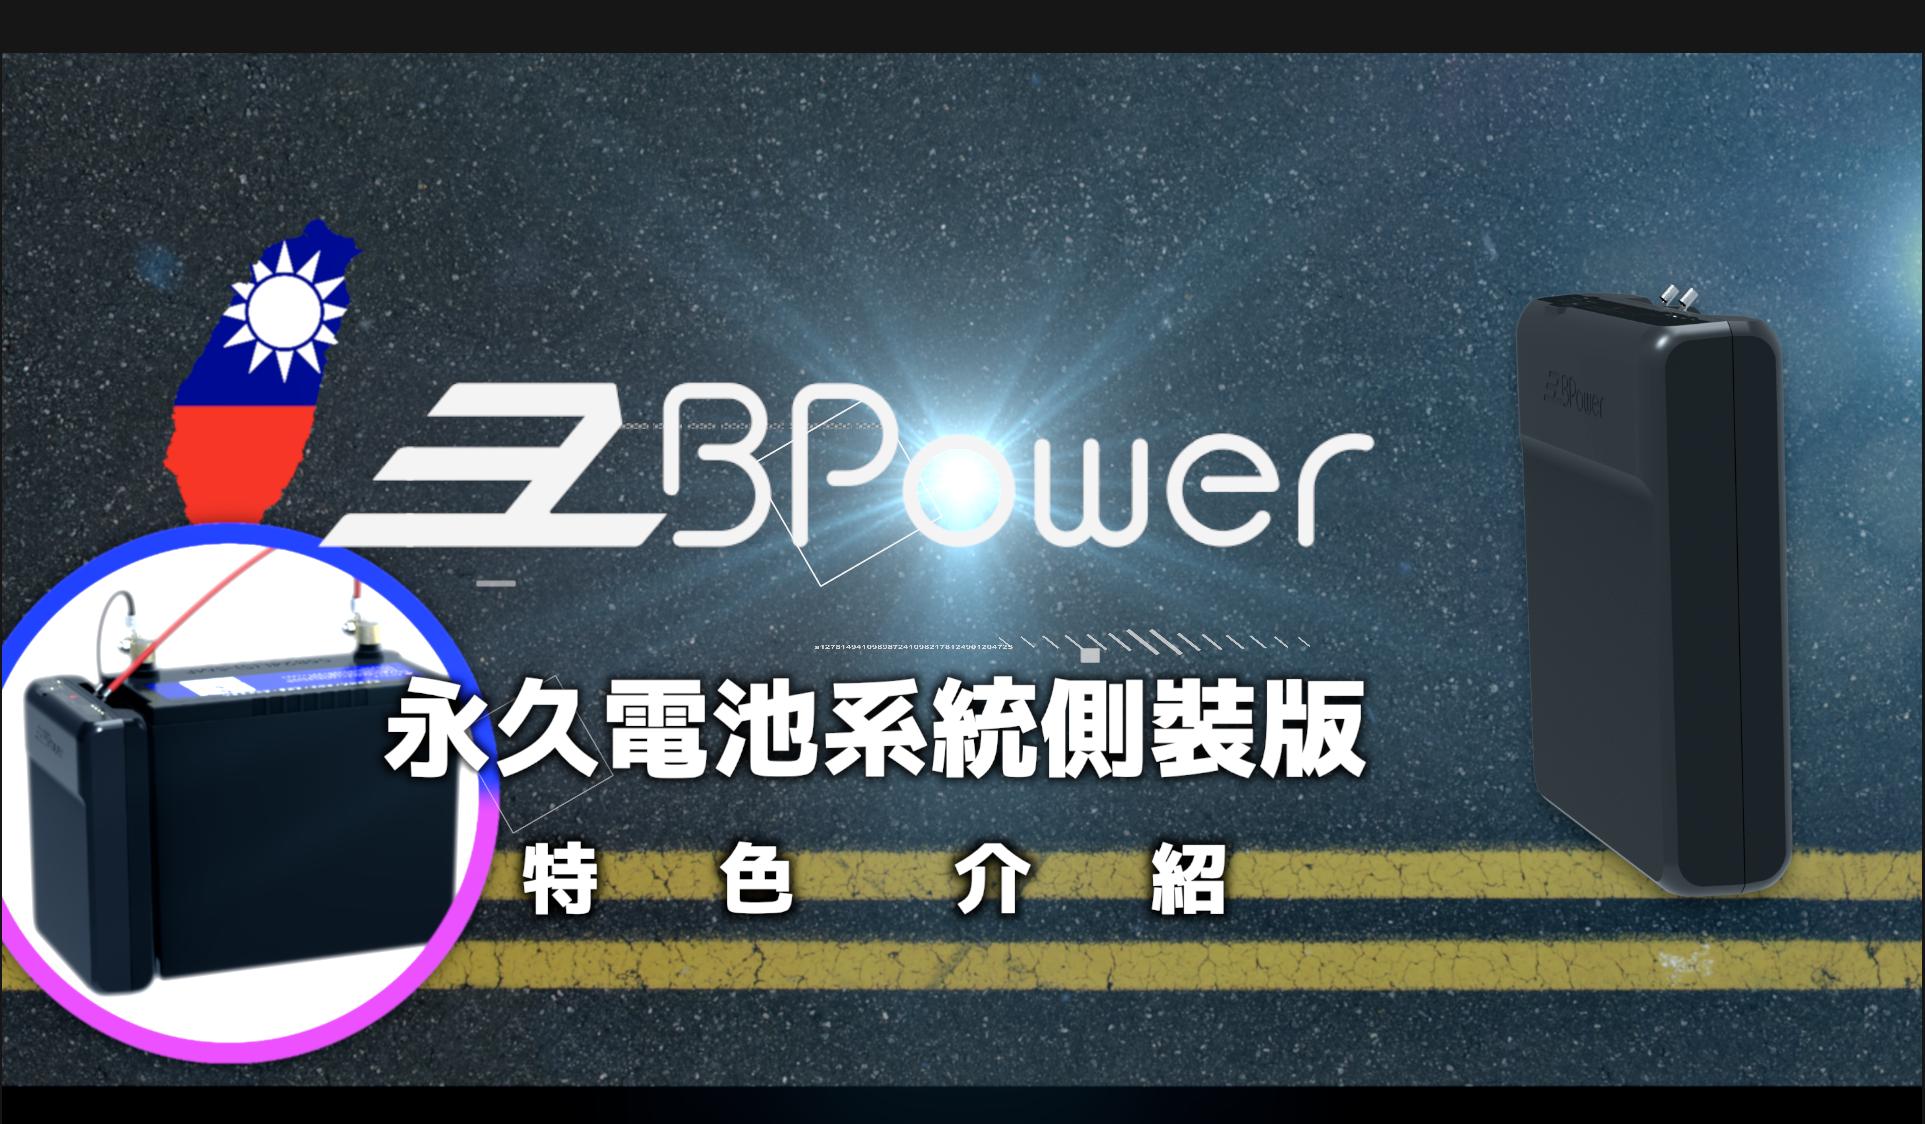 EzBPower | 侧装版-产品特色 | 永久电池系统